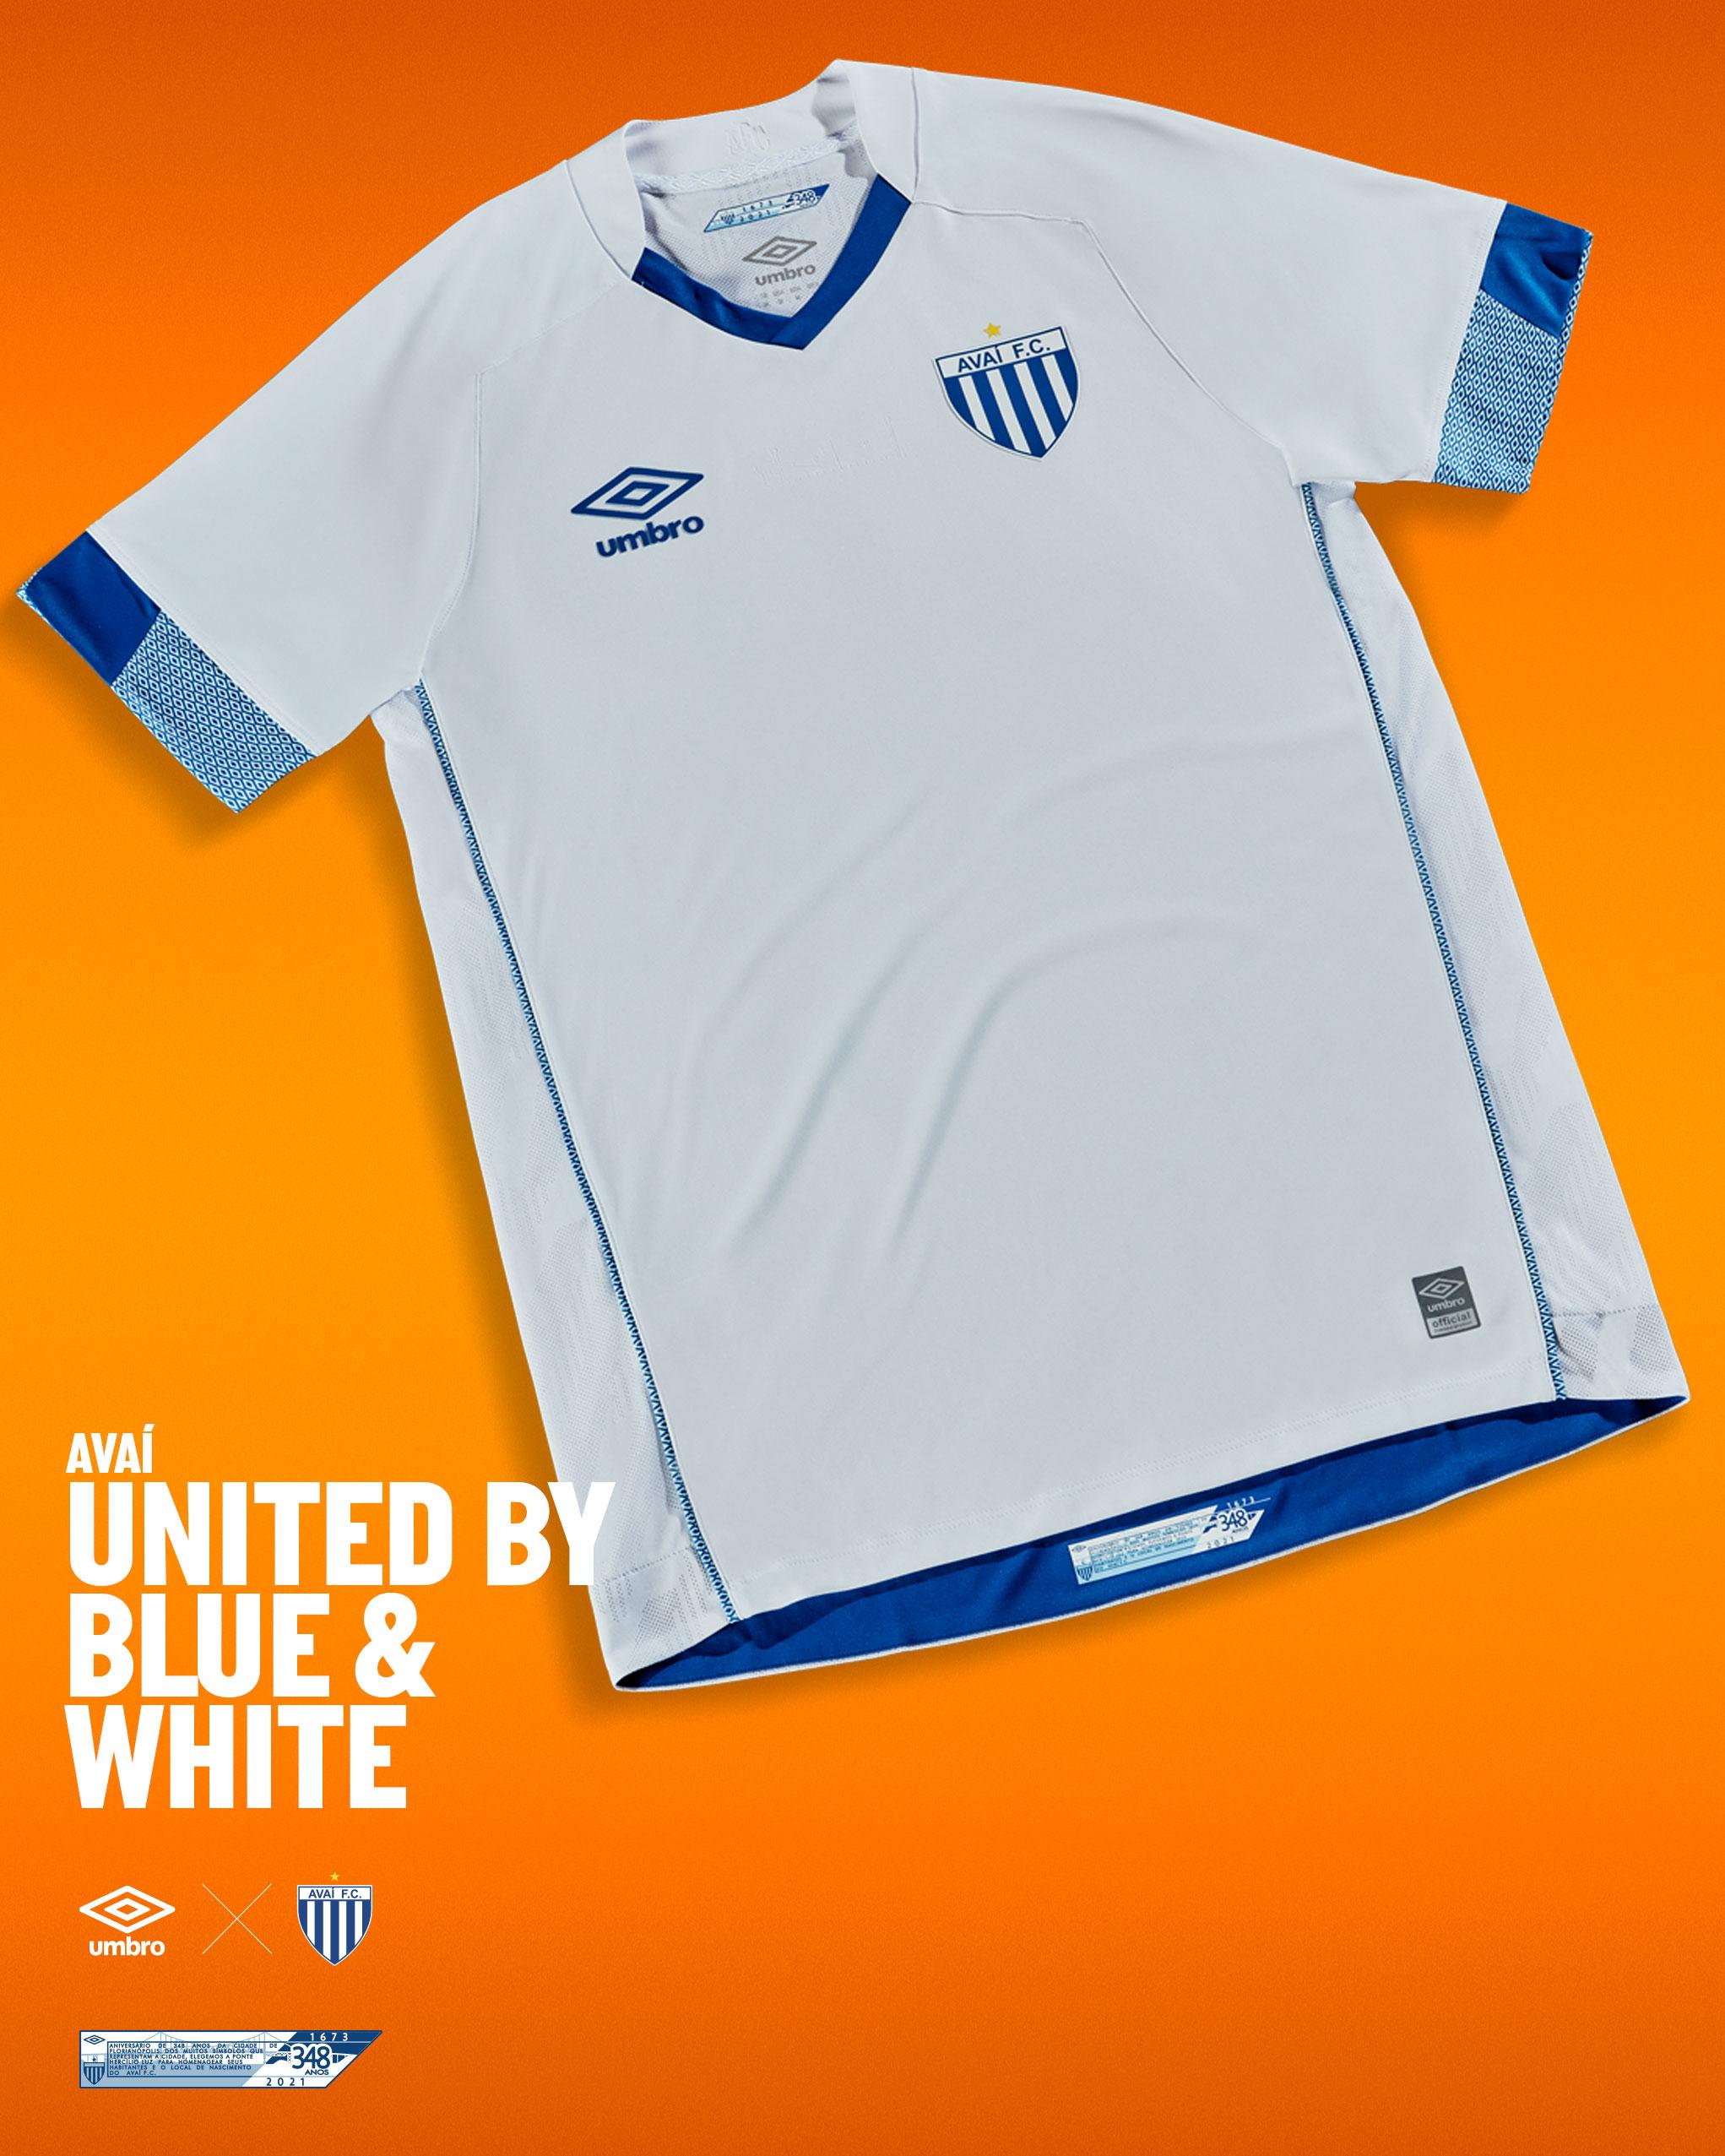 Avaí 2021 Umbro Home and Away Shirts | 20/21 Kits | Football shirt ...